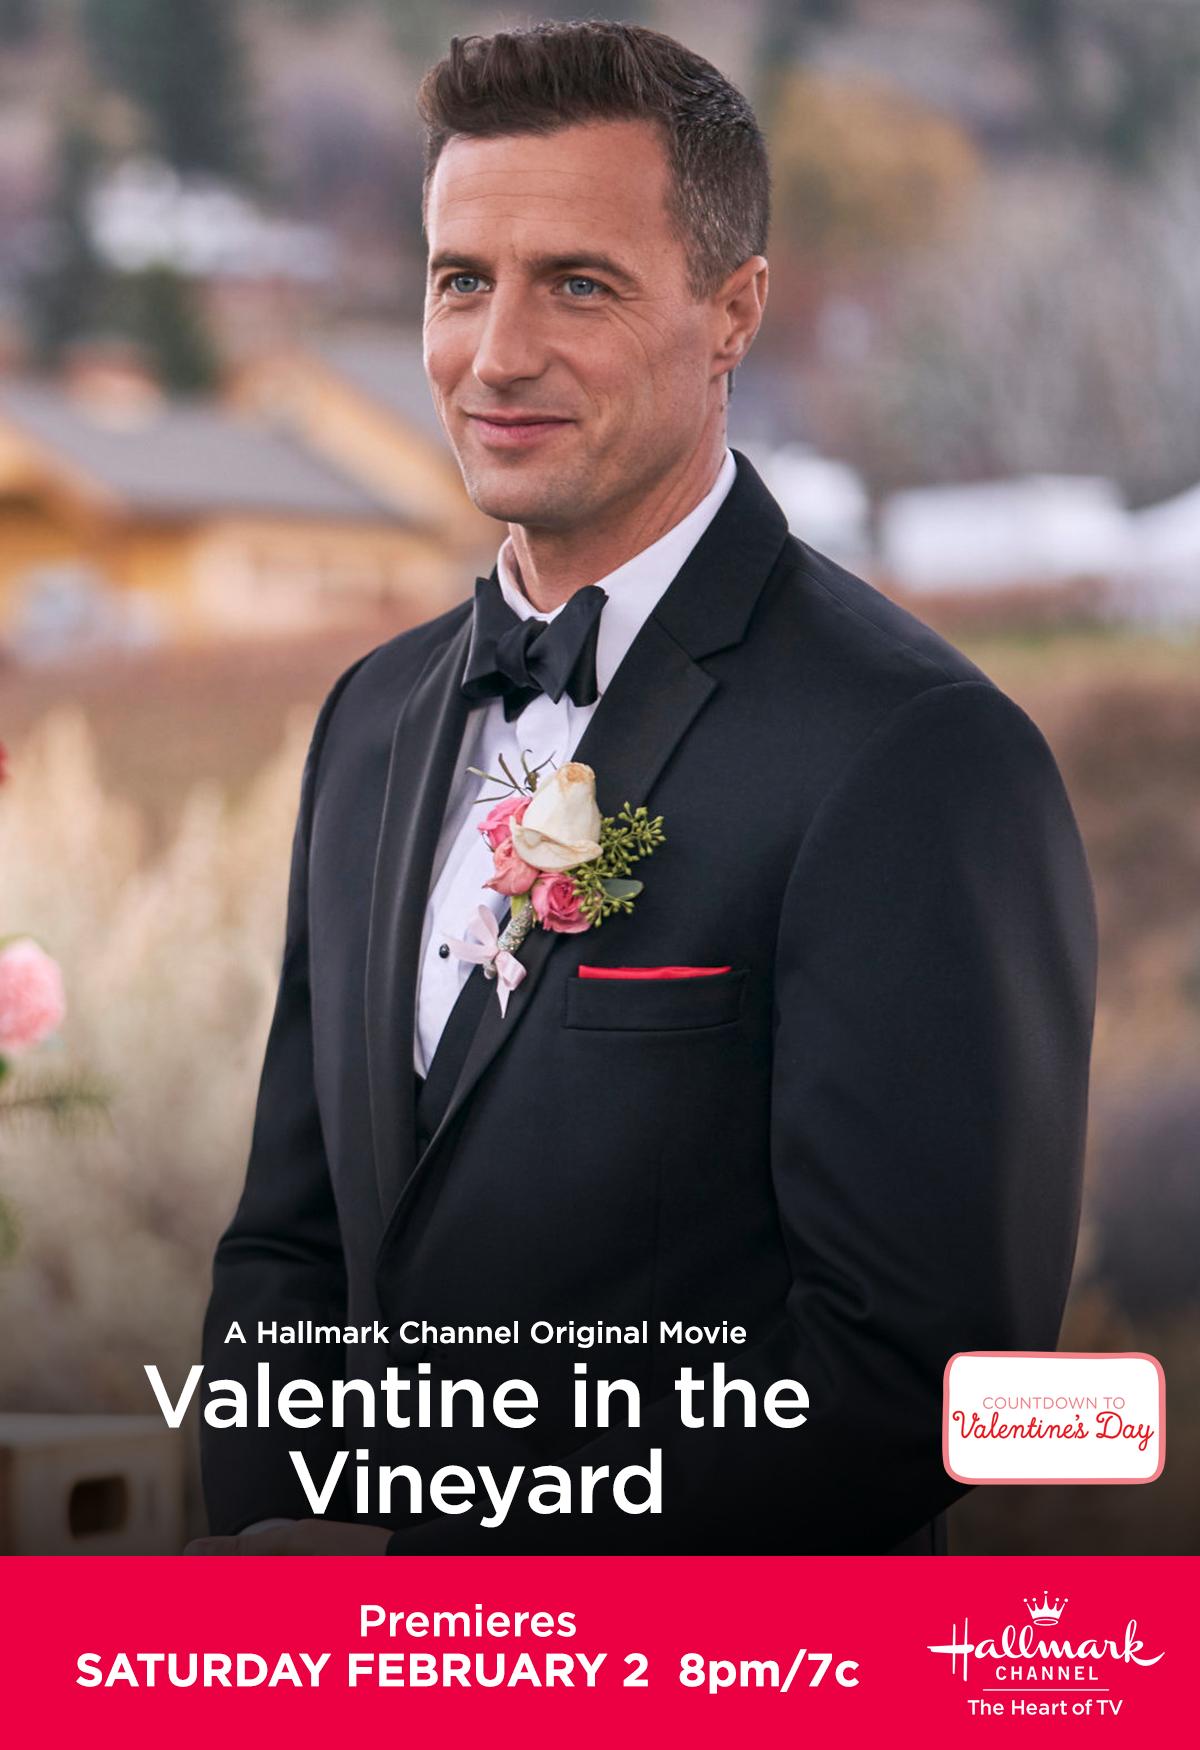 Nate Chesapeake Shores Brendan Penny Looks Dapper In Valentine In The Vineyard Make A Date With The First Count Hallmark Channel Hallmark Movies Hallmark